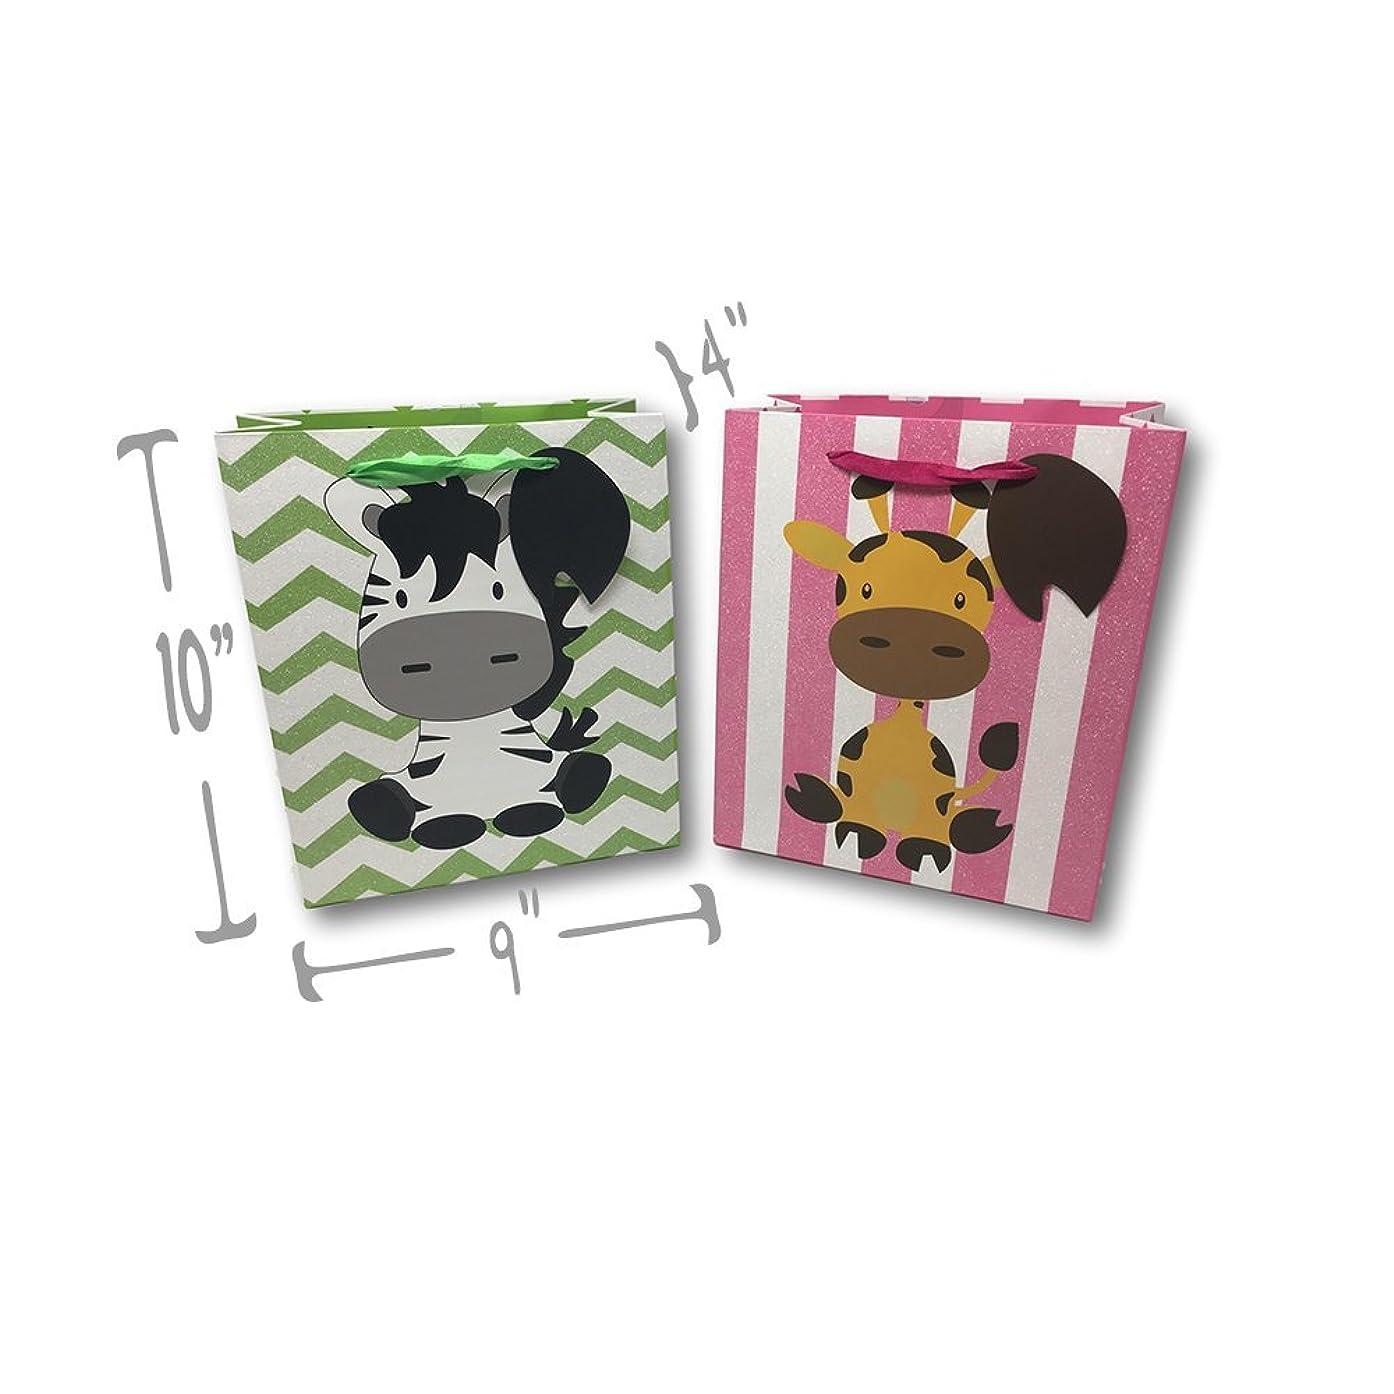 Baby Shower Boy or Girl High Quality Glitter Gift Wrap Bags Printed Inside & Out (2 Pack - Giraffe (Pink White) & Zebra (Green & White) Glitter Bags, Medium 10